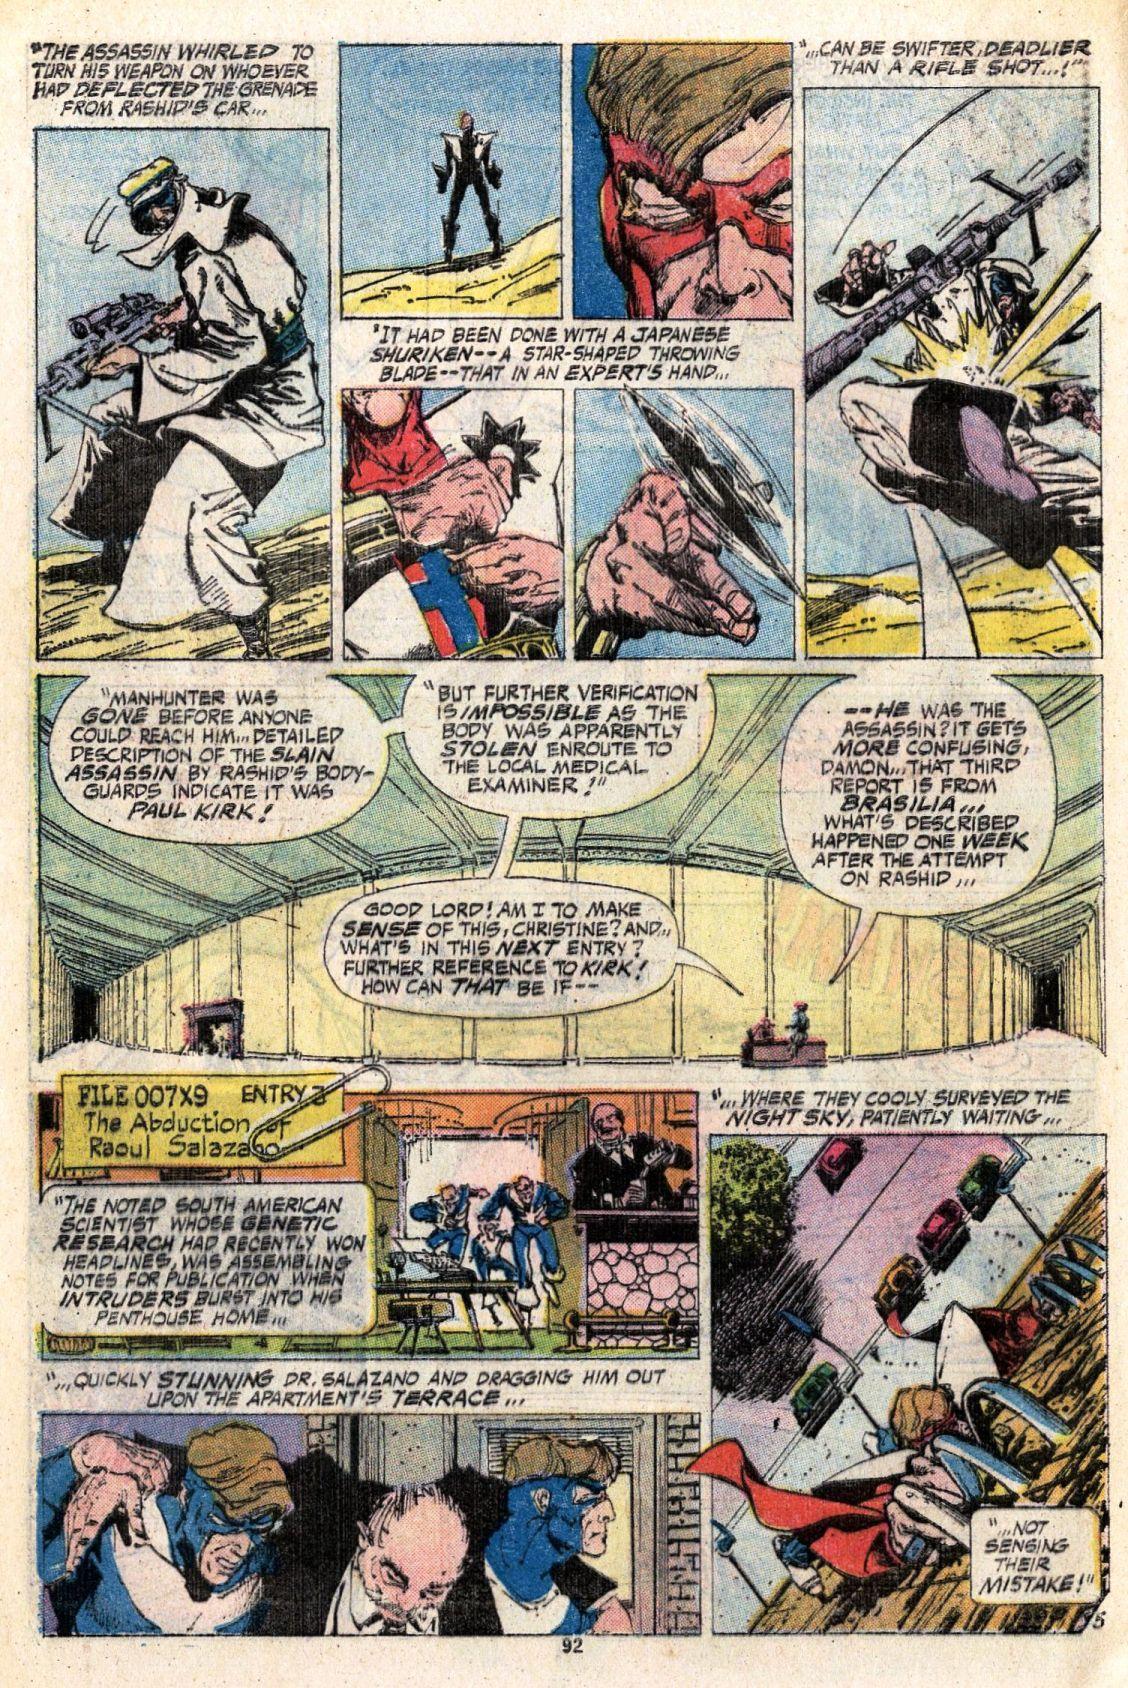 Detective Comics (1937) 438 Page 92